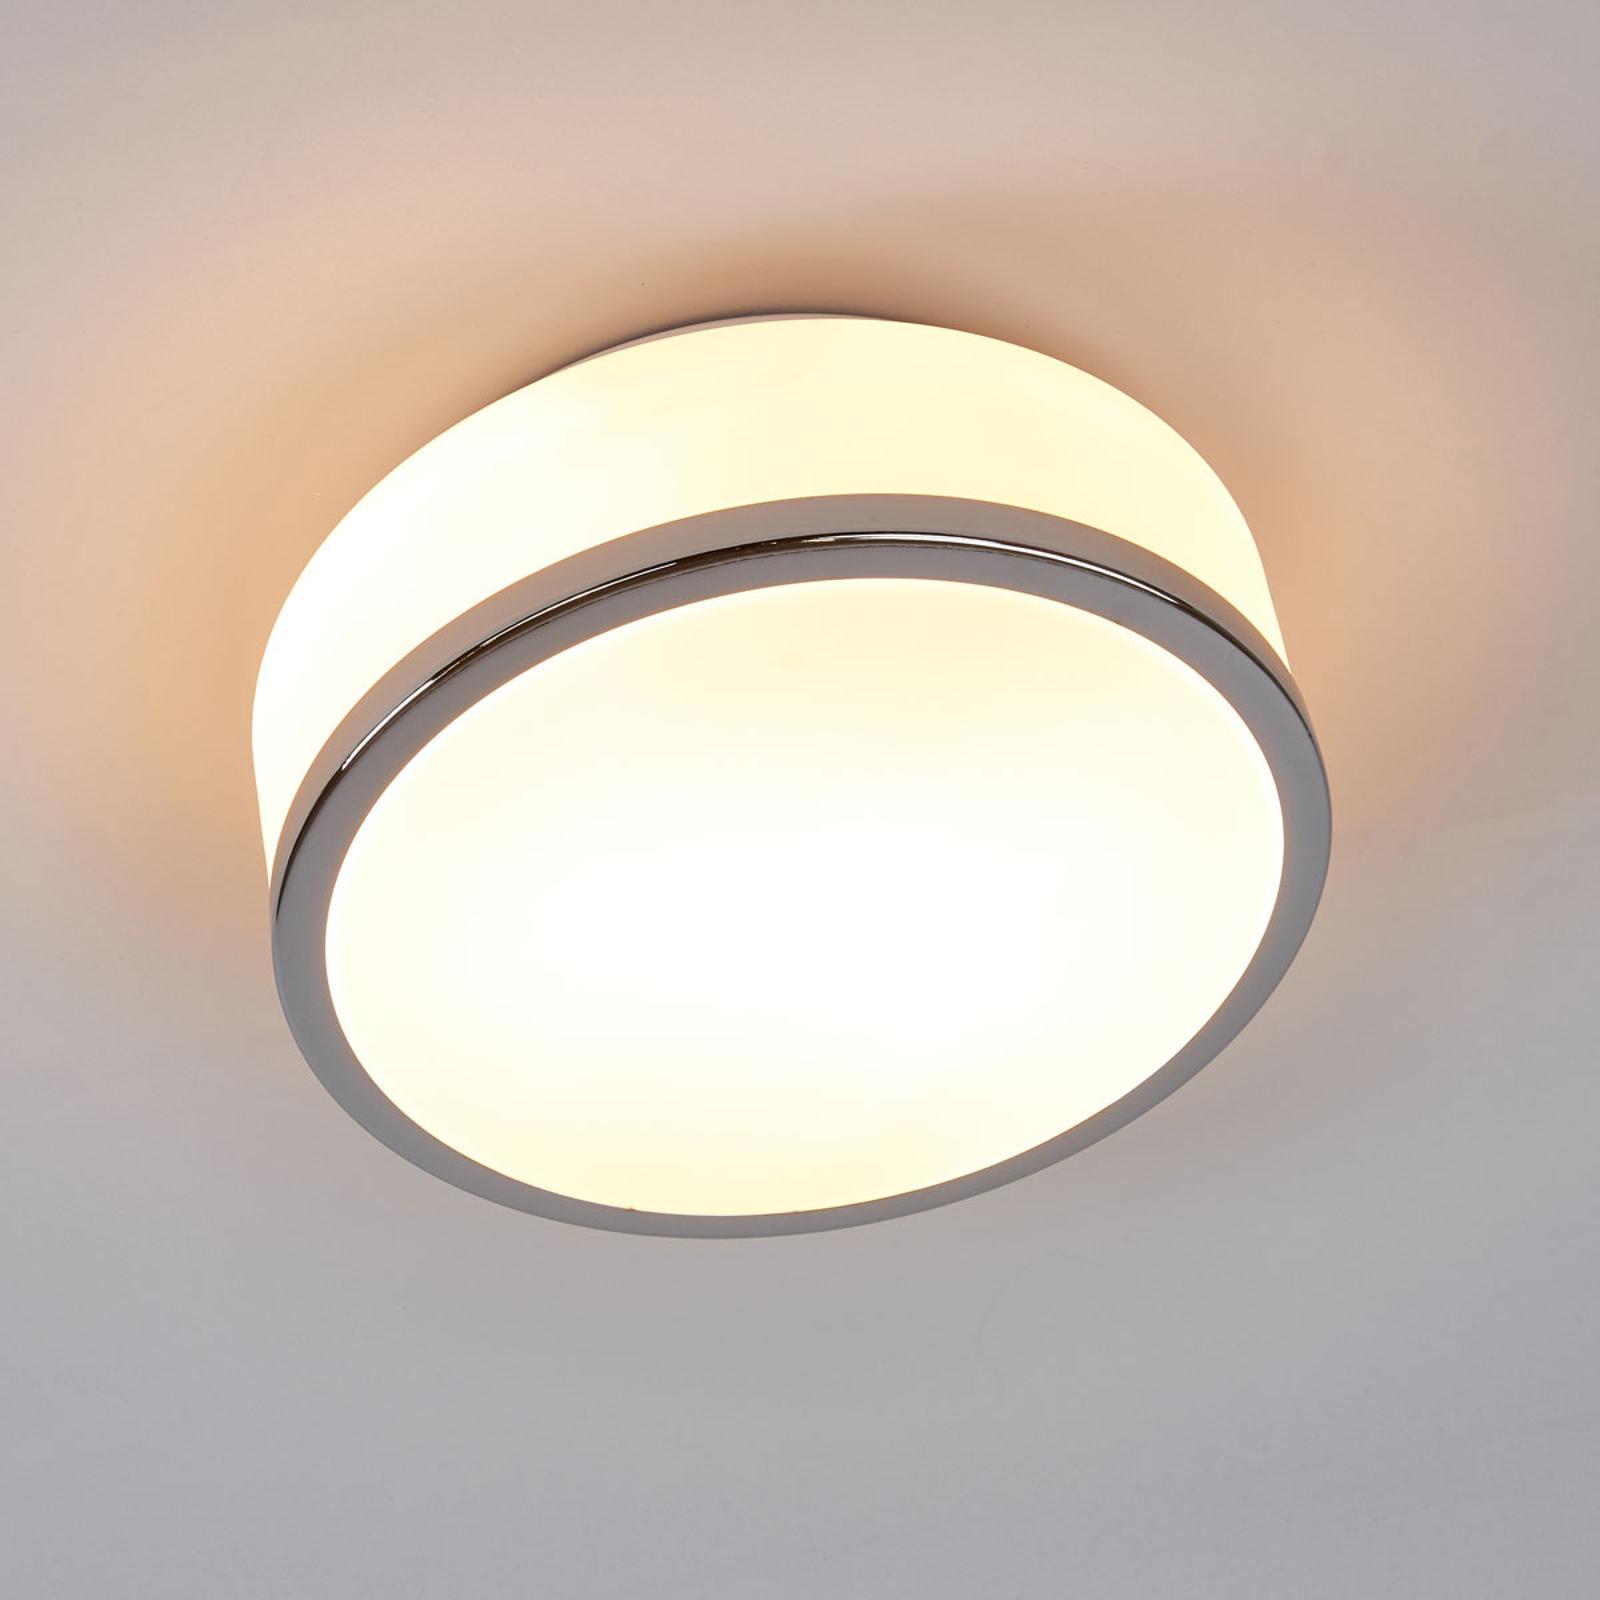 Taklampe Flush IP44, Ø 23 cm, krom